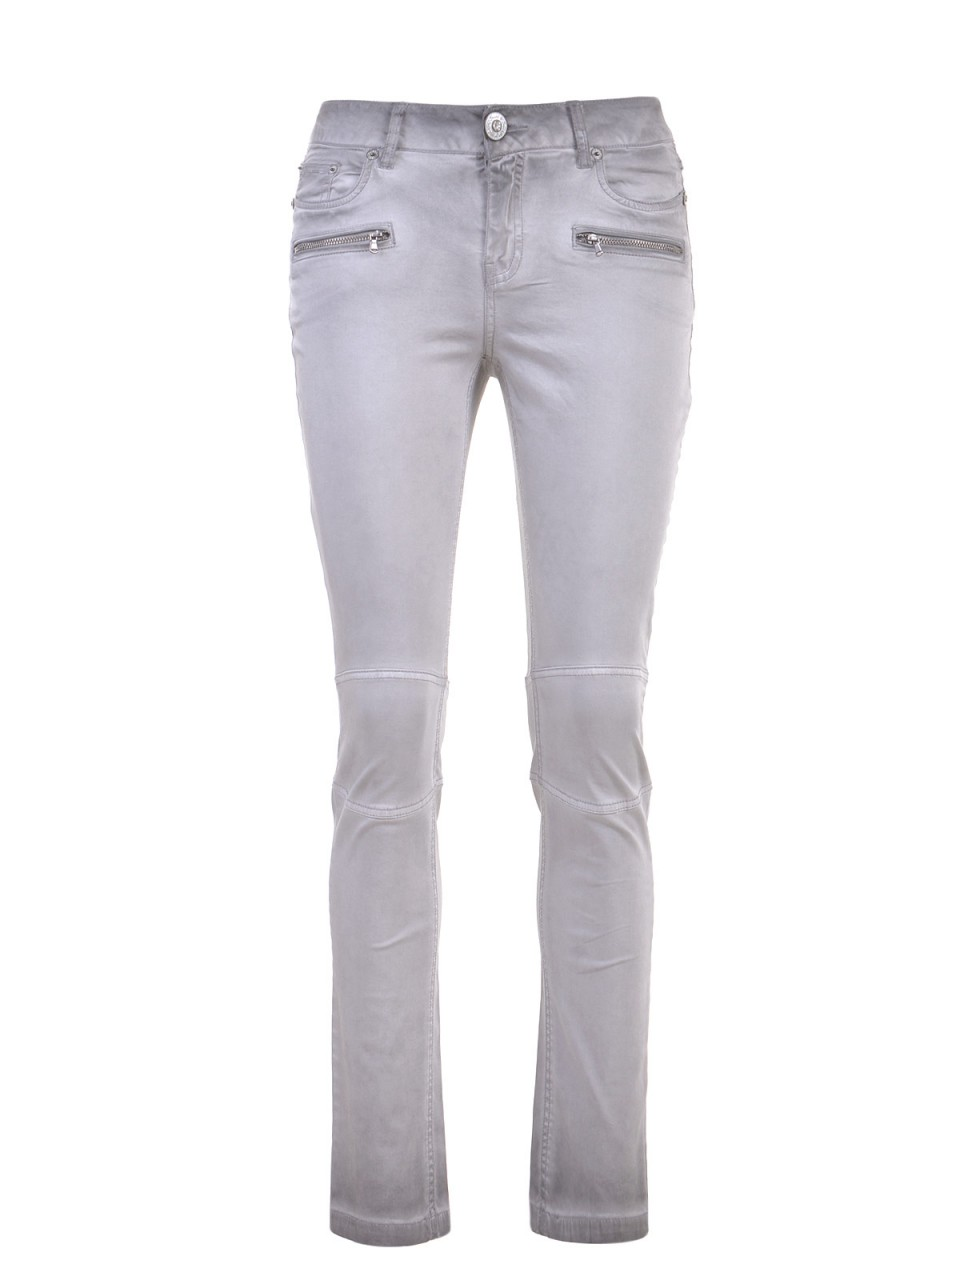 att-damen-jeans-grau